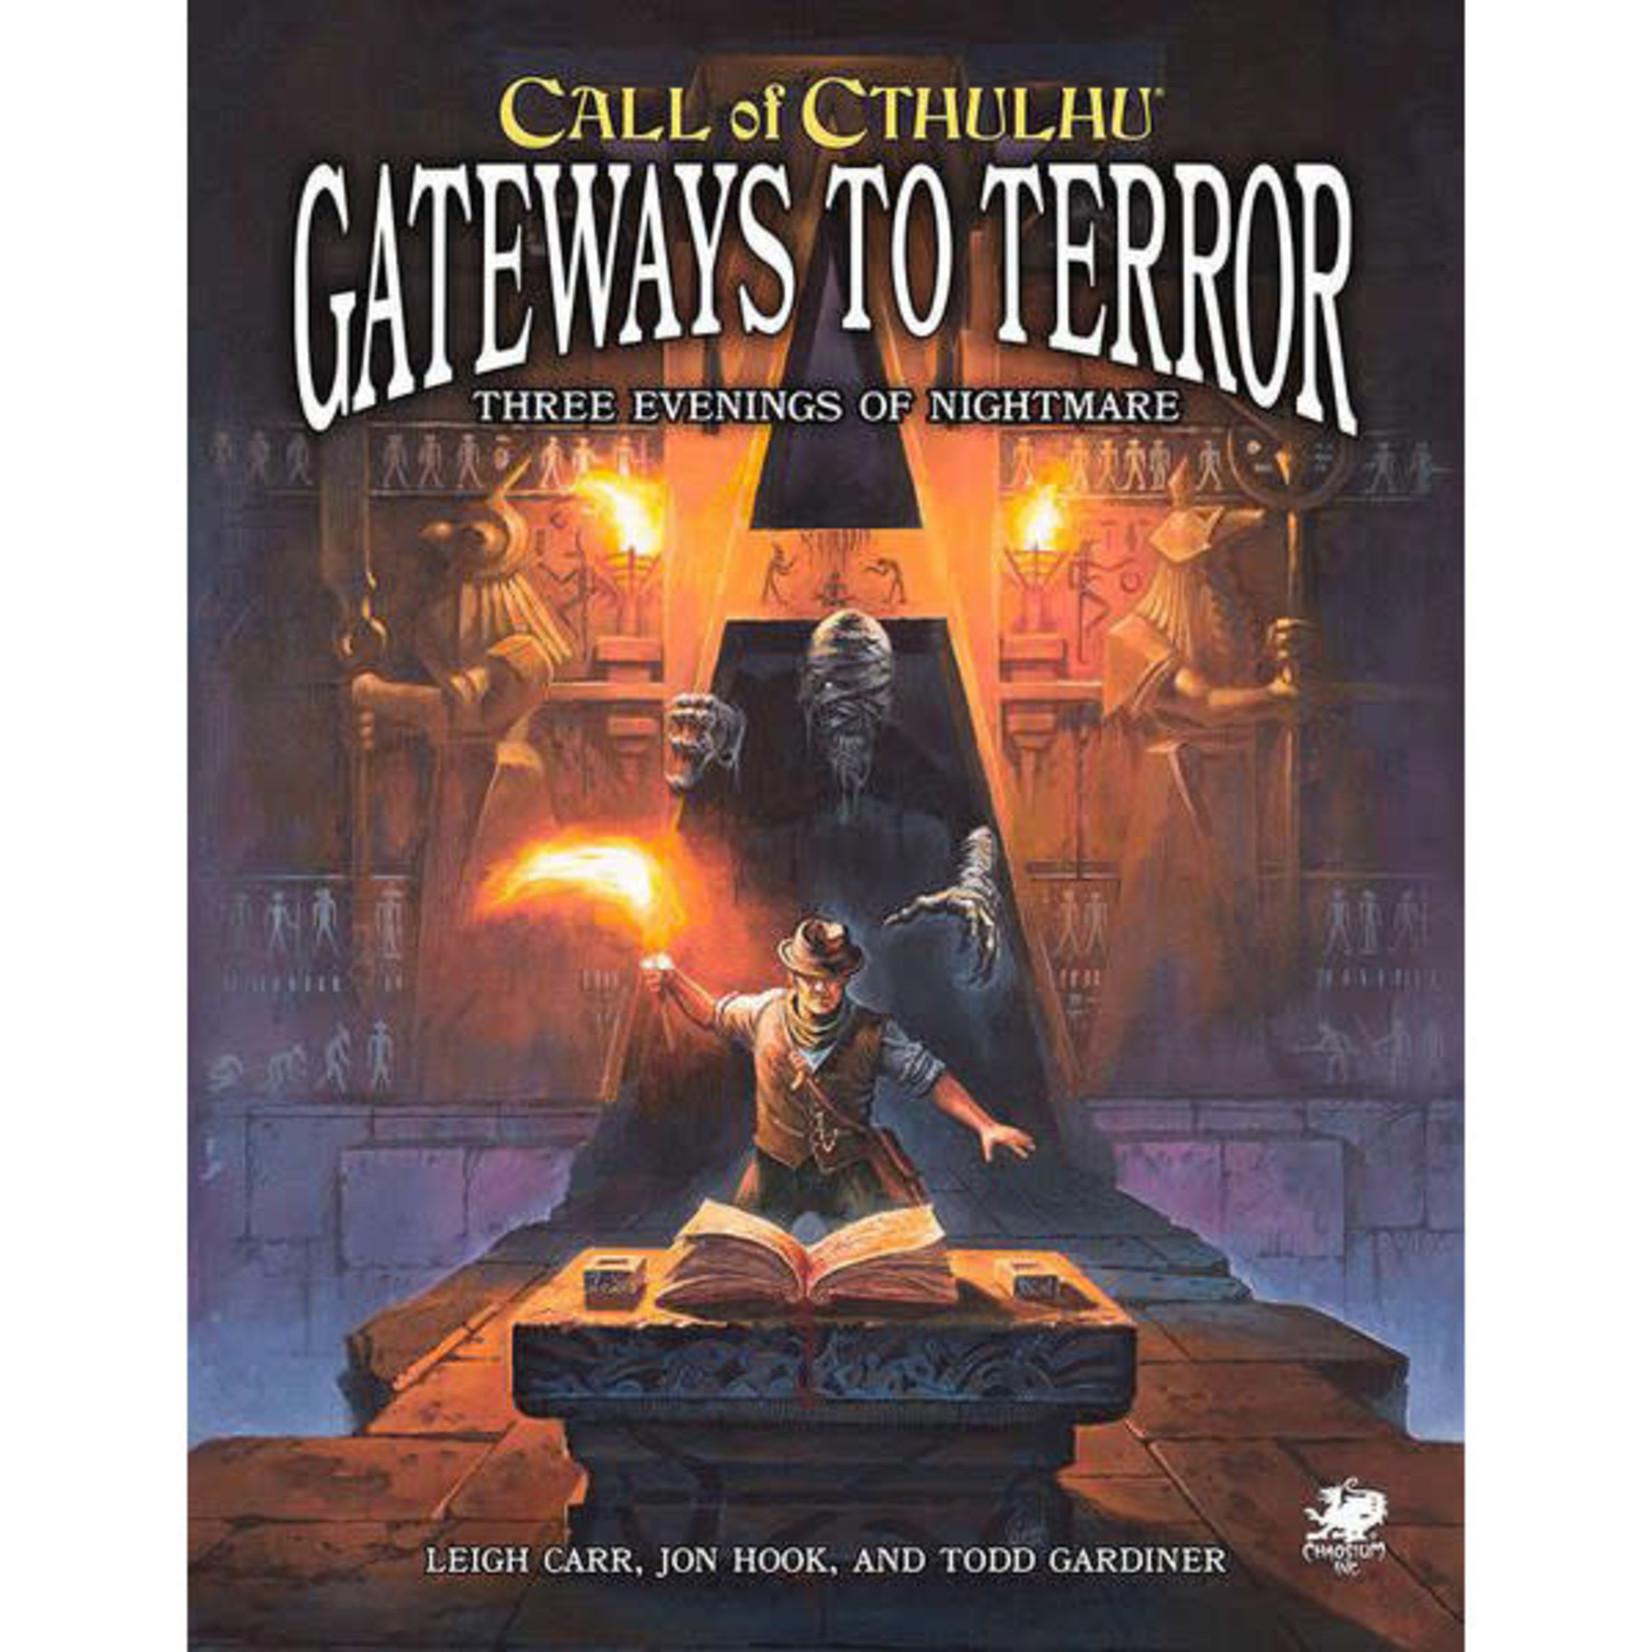 Call of Cthulhu RPG 7E Gateway to Terror